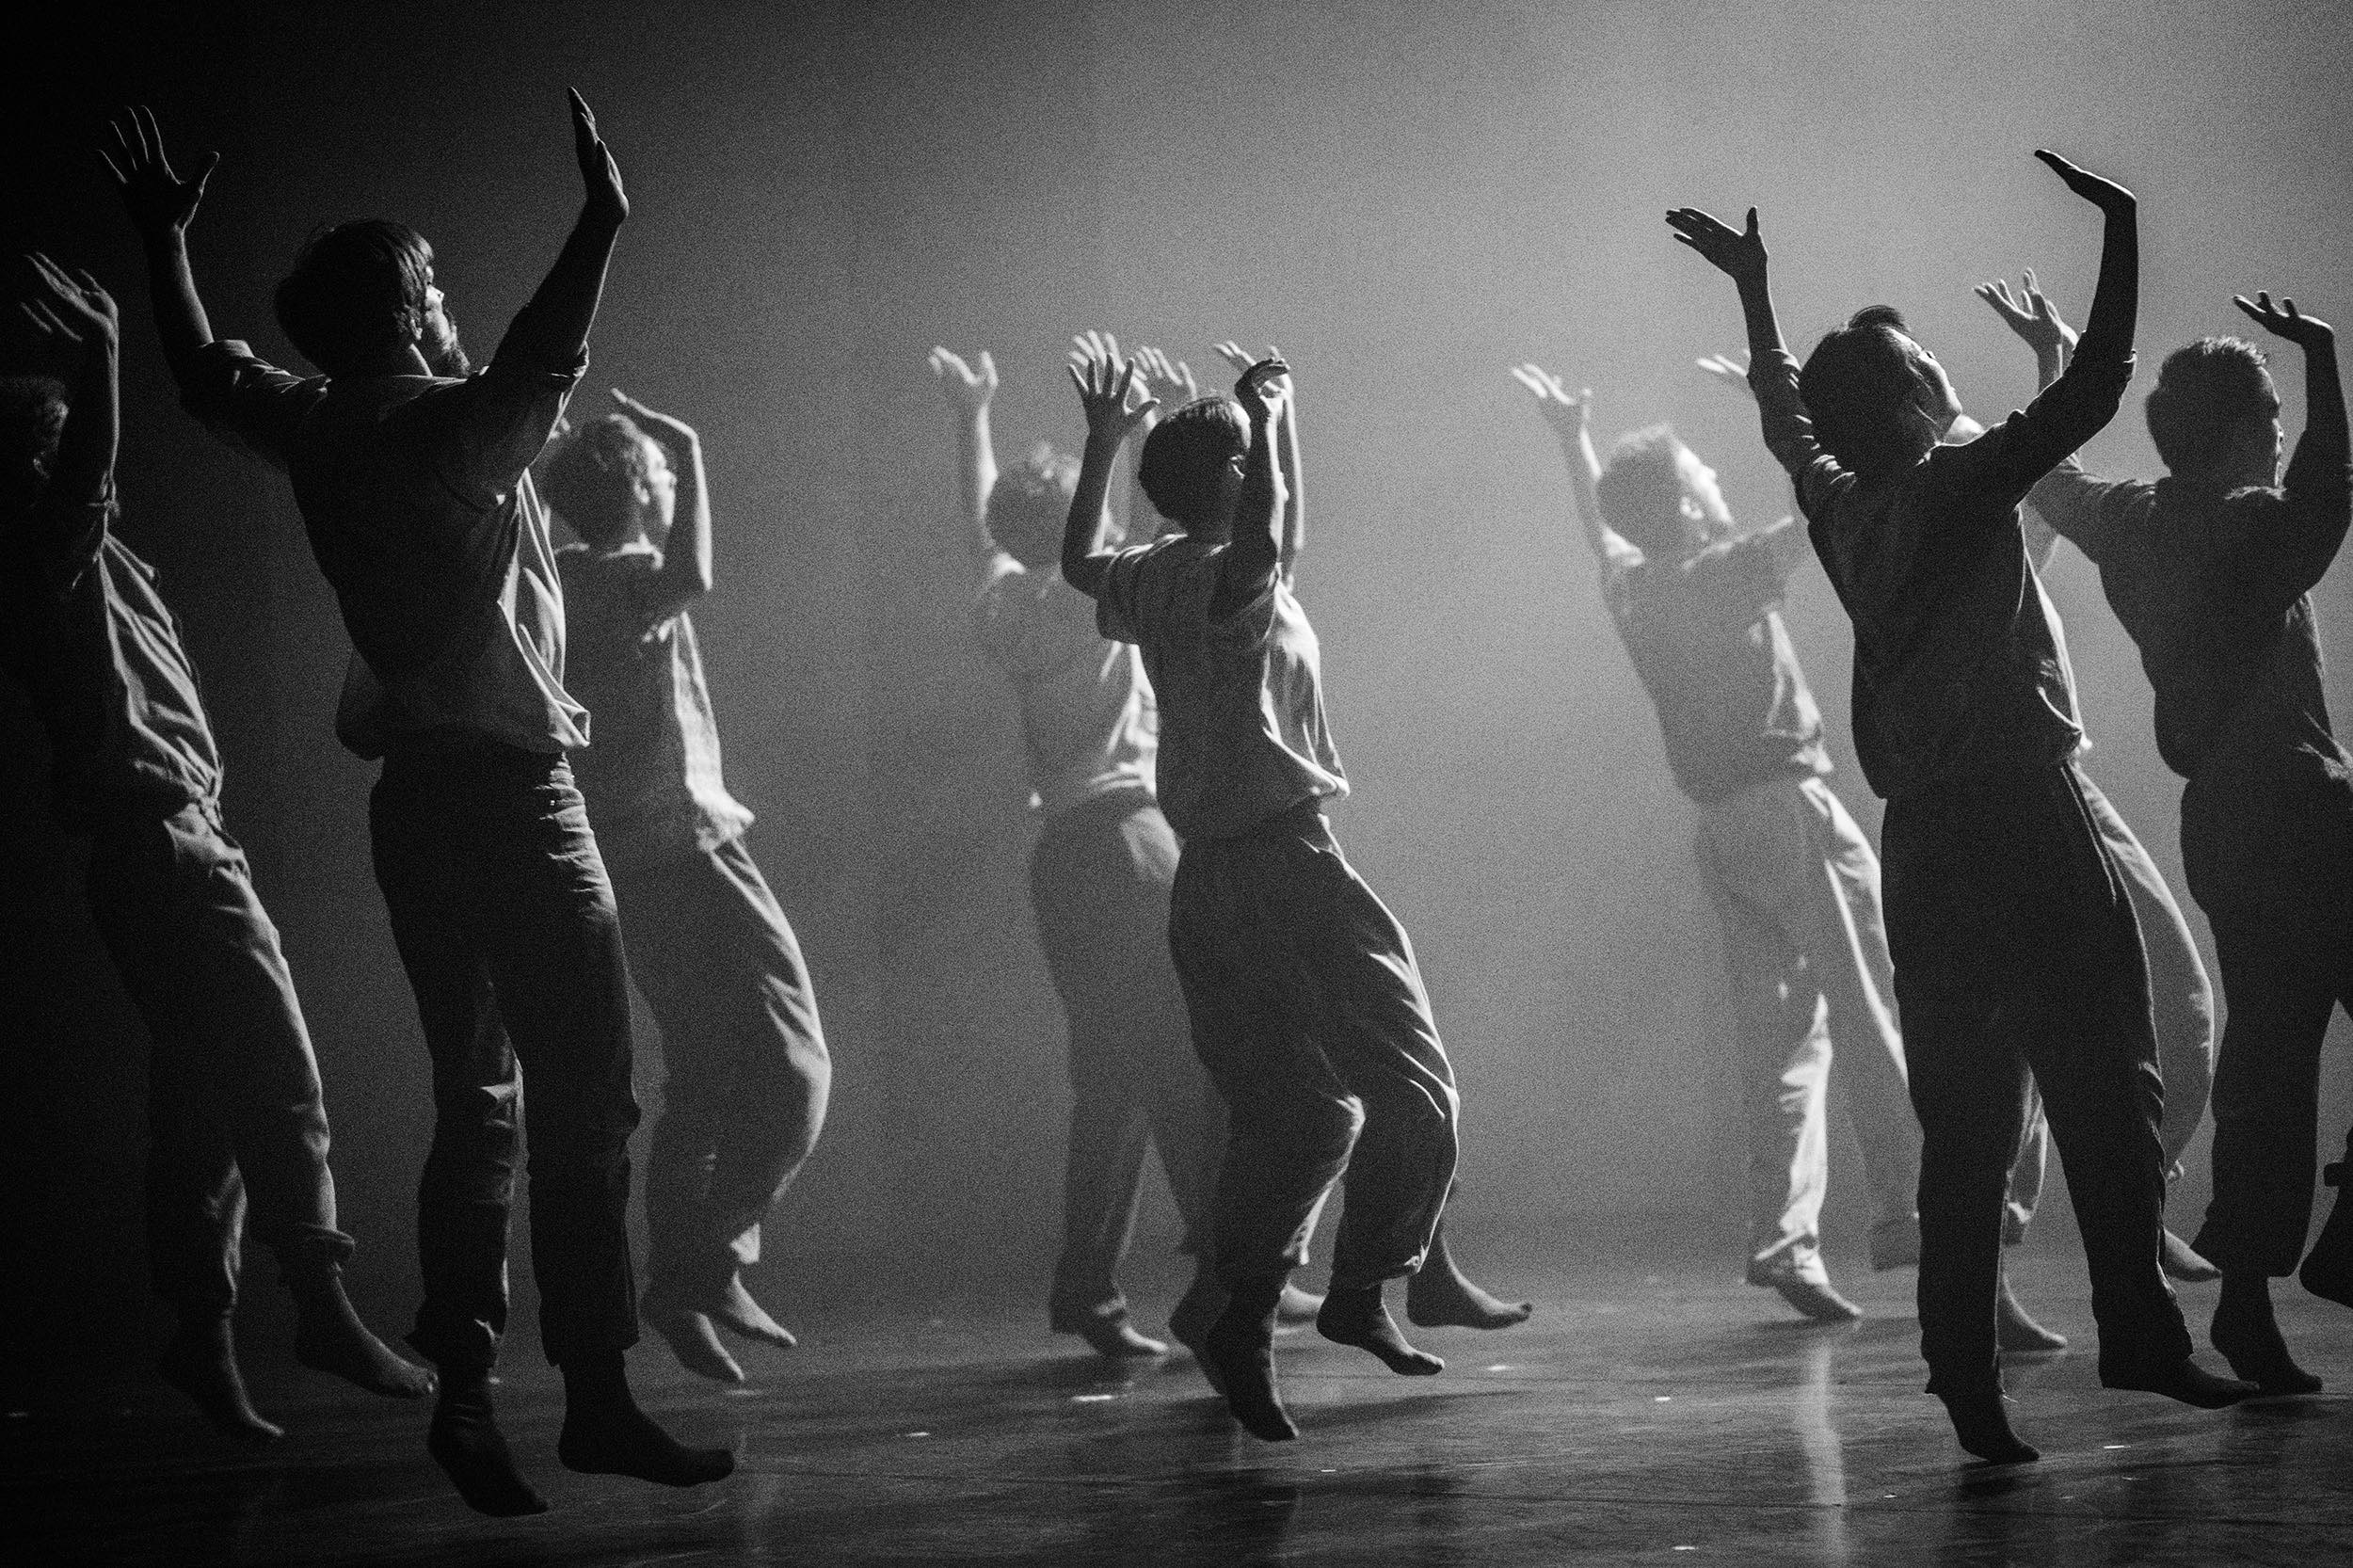 878b662a50c Διεθνές Φεστιβάλ Σύγχρονου Χορού Dance Days Chania 2019 - Φεστιβάλ ...